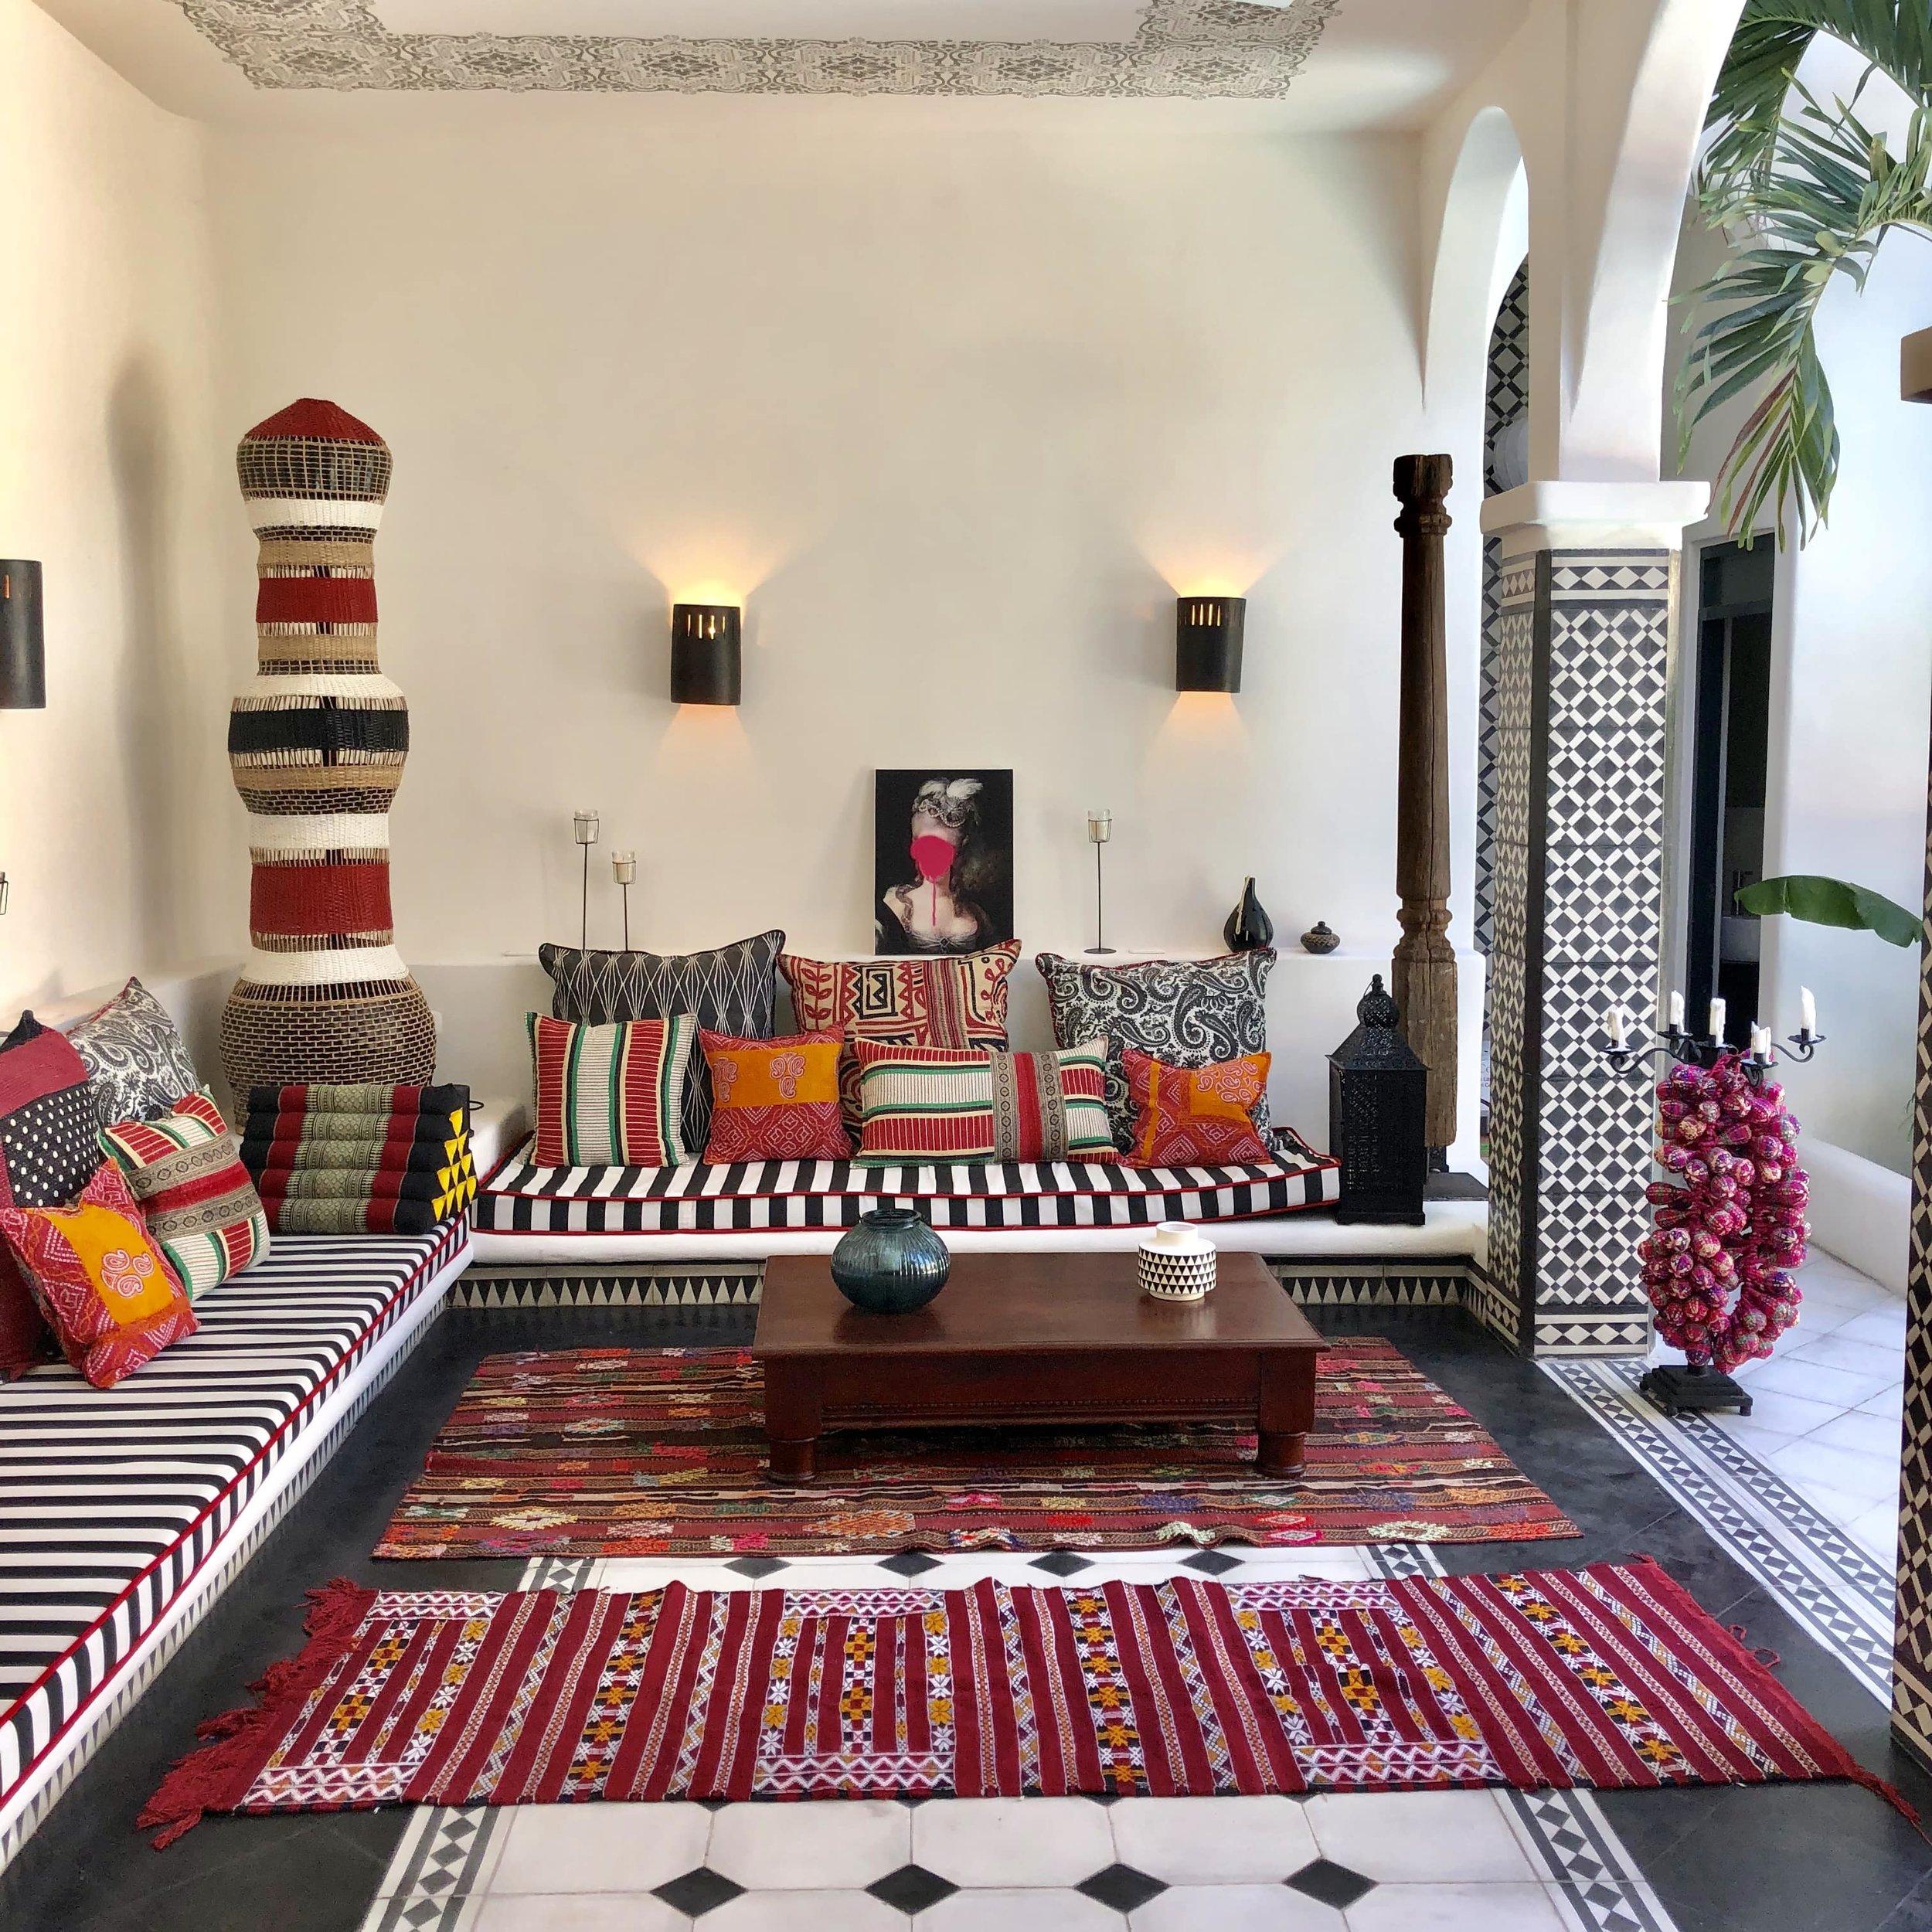 Real Estate For Sale Granada Nicaragua 6-min.jpeg